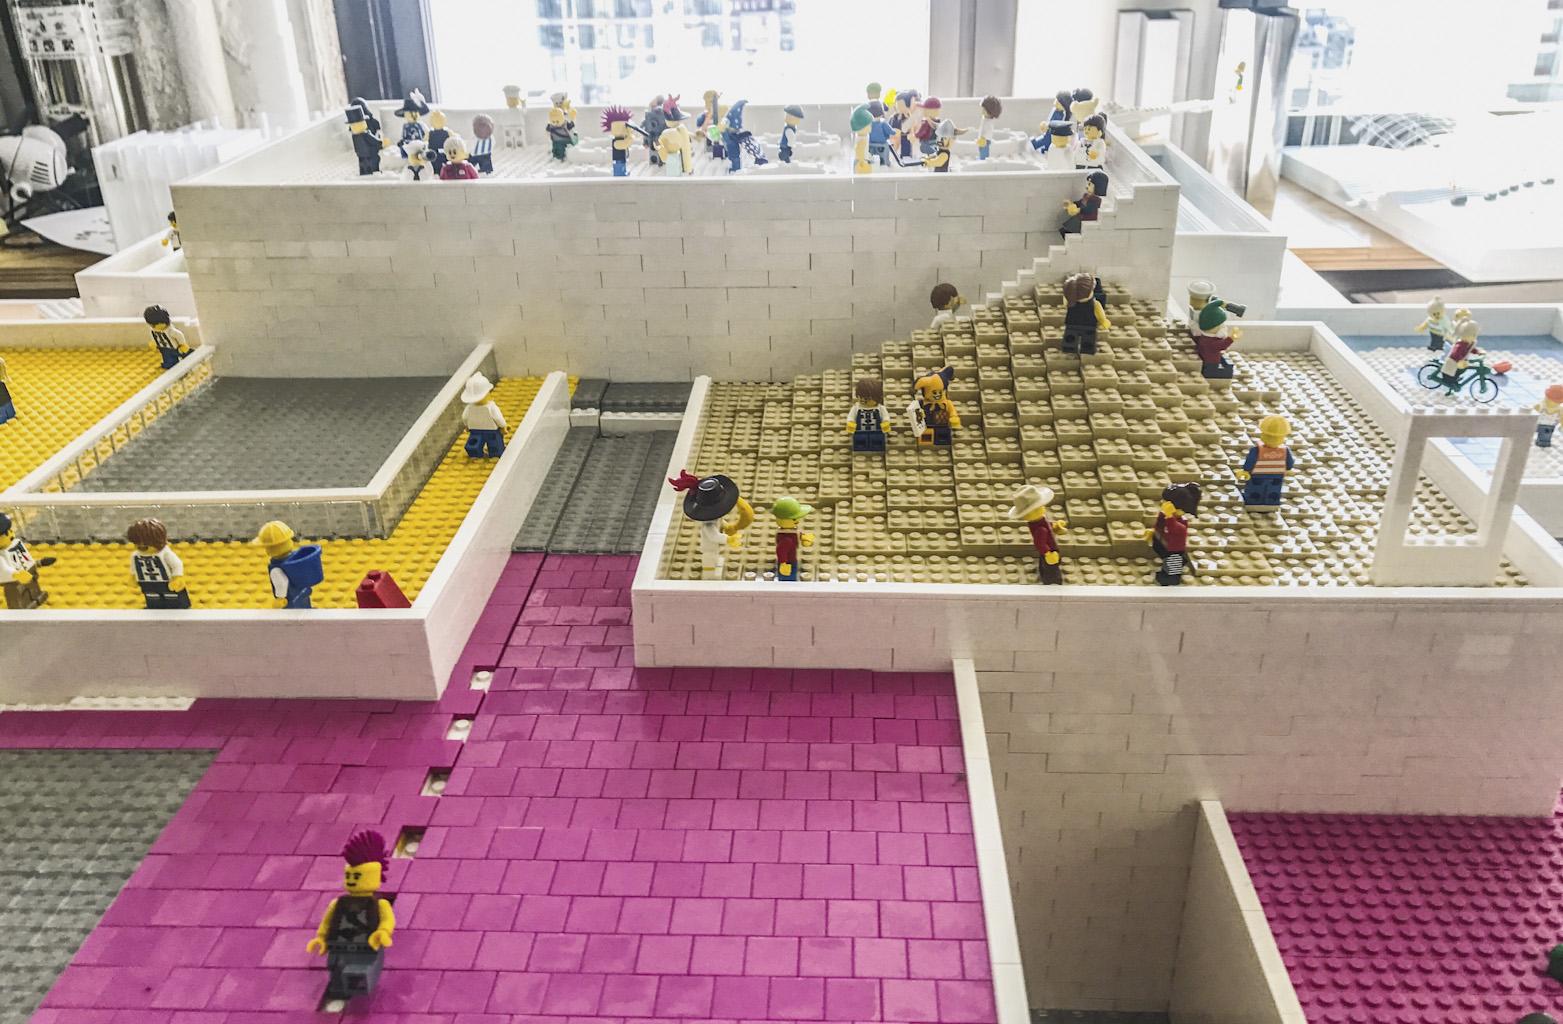 BIG's lego house model, in Billund Denmark, expected completion September 2017.